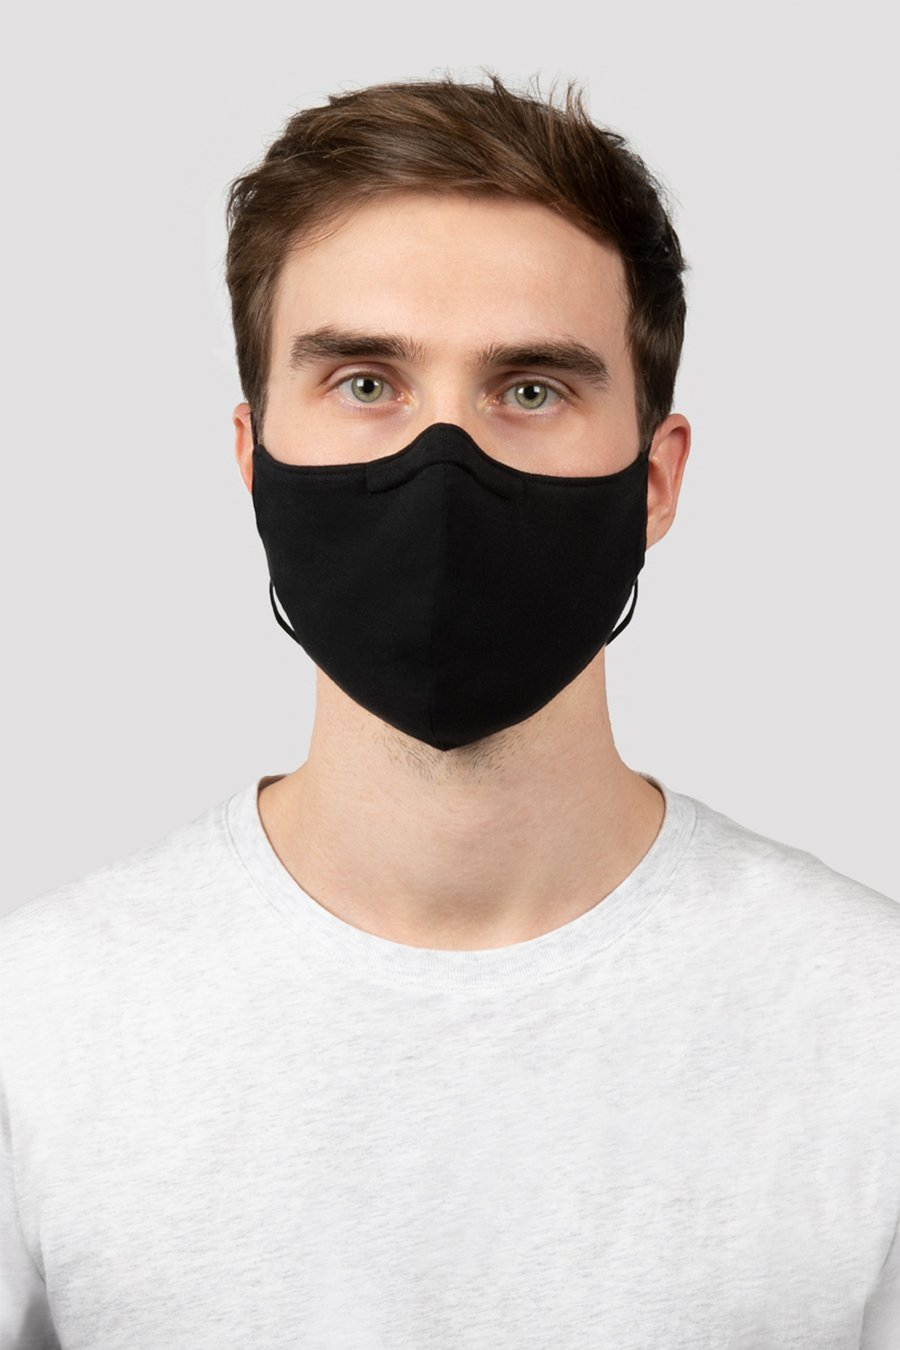 Bloch B-Safe Face Mask Lanyard Adult 3-pack